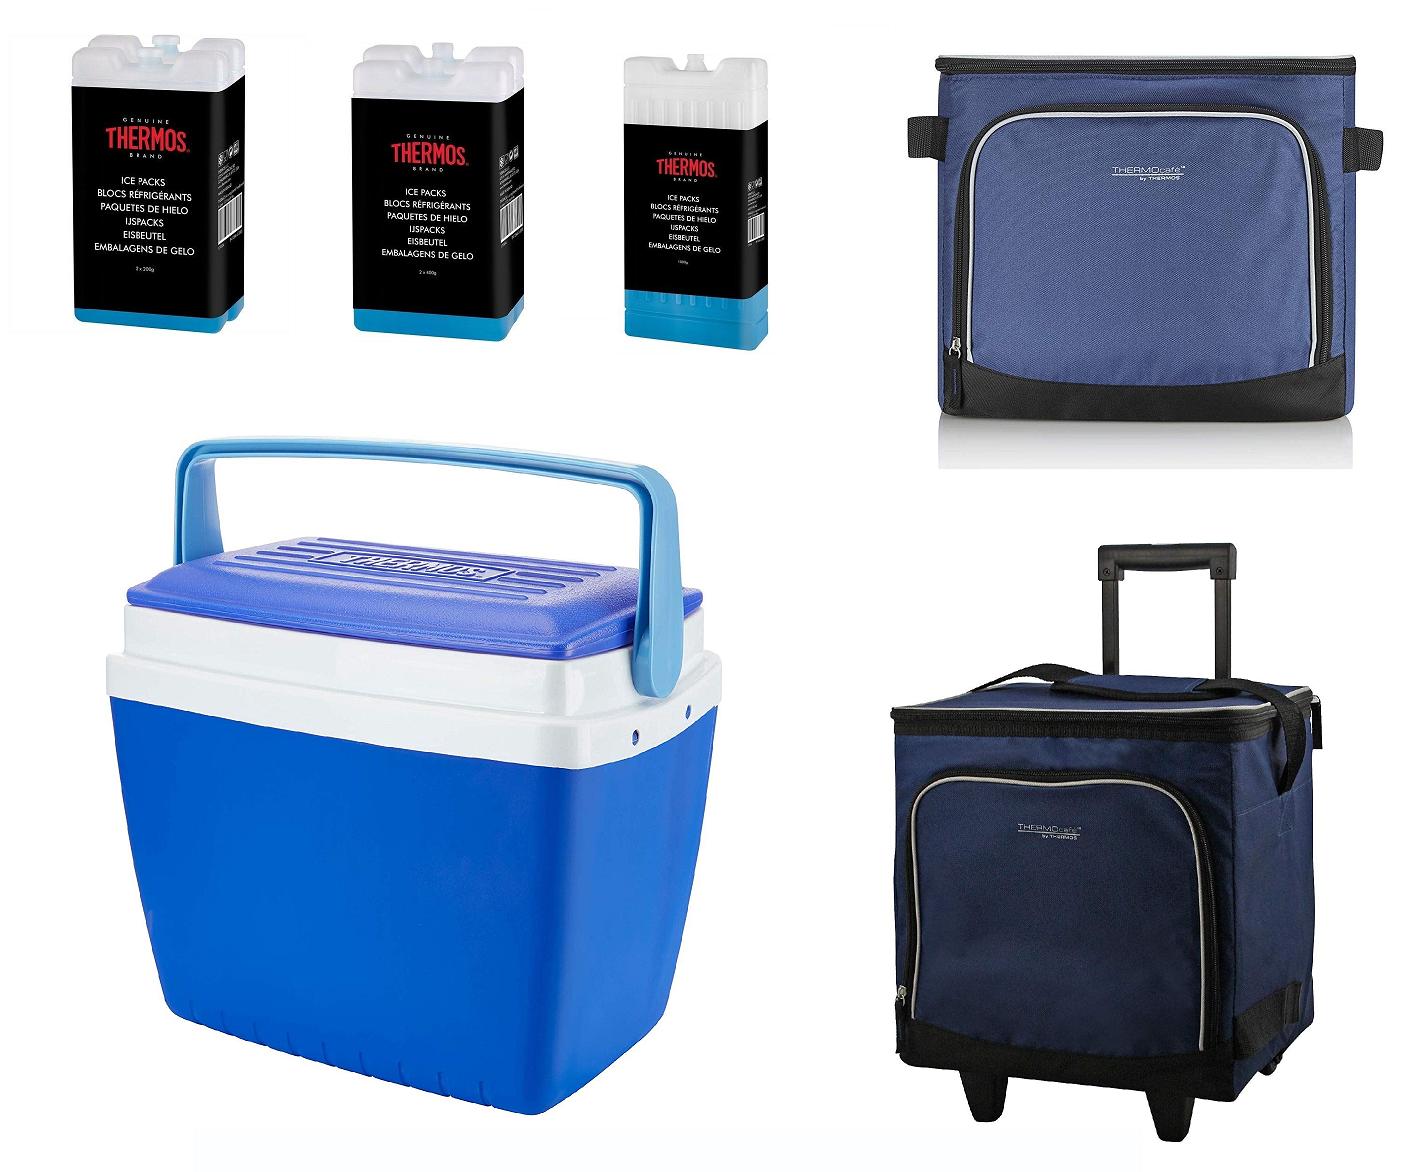 10L Insulated Cooler Lunch Food Drinks Freezer Bag Beach Picnic Shoulder Strap